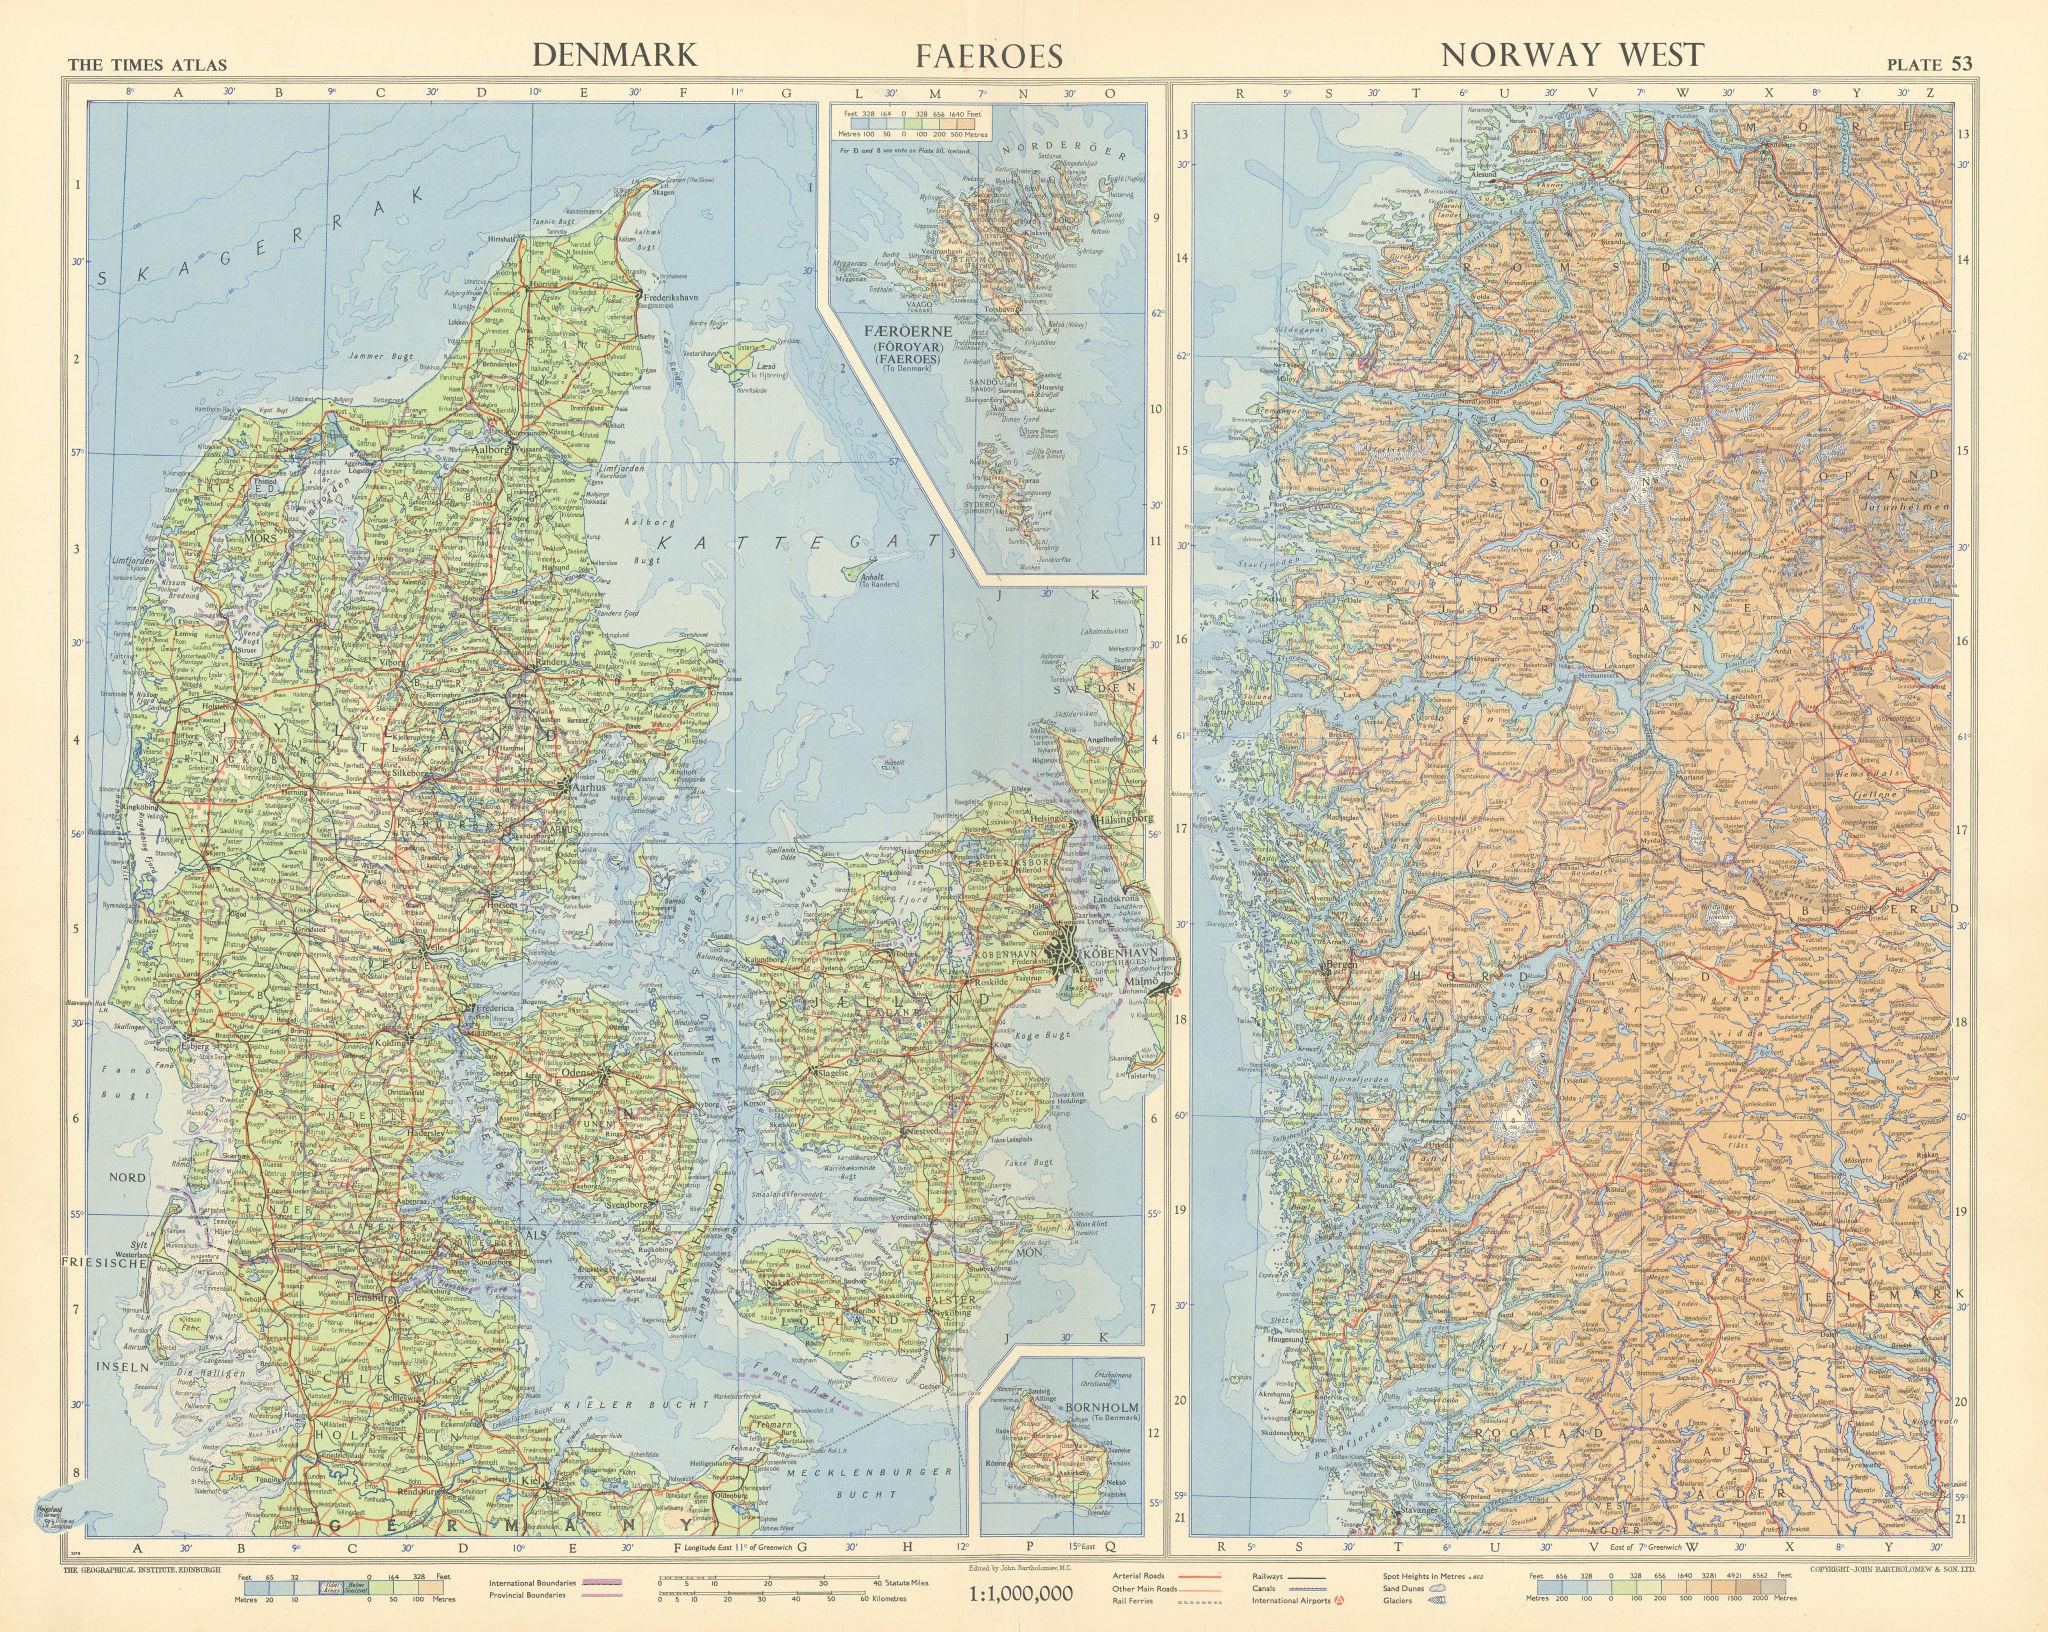 Denmark & western Norway. Fjords. Faeroe islands. TIMES 1955 old vintage map